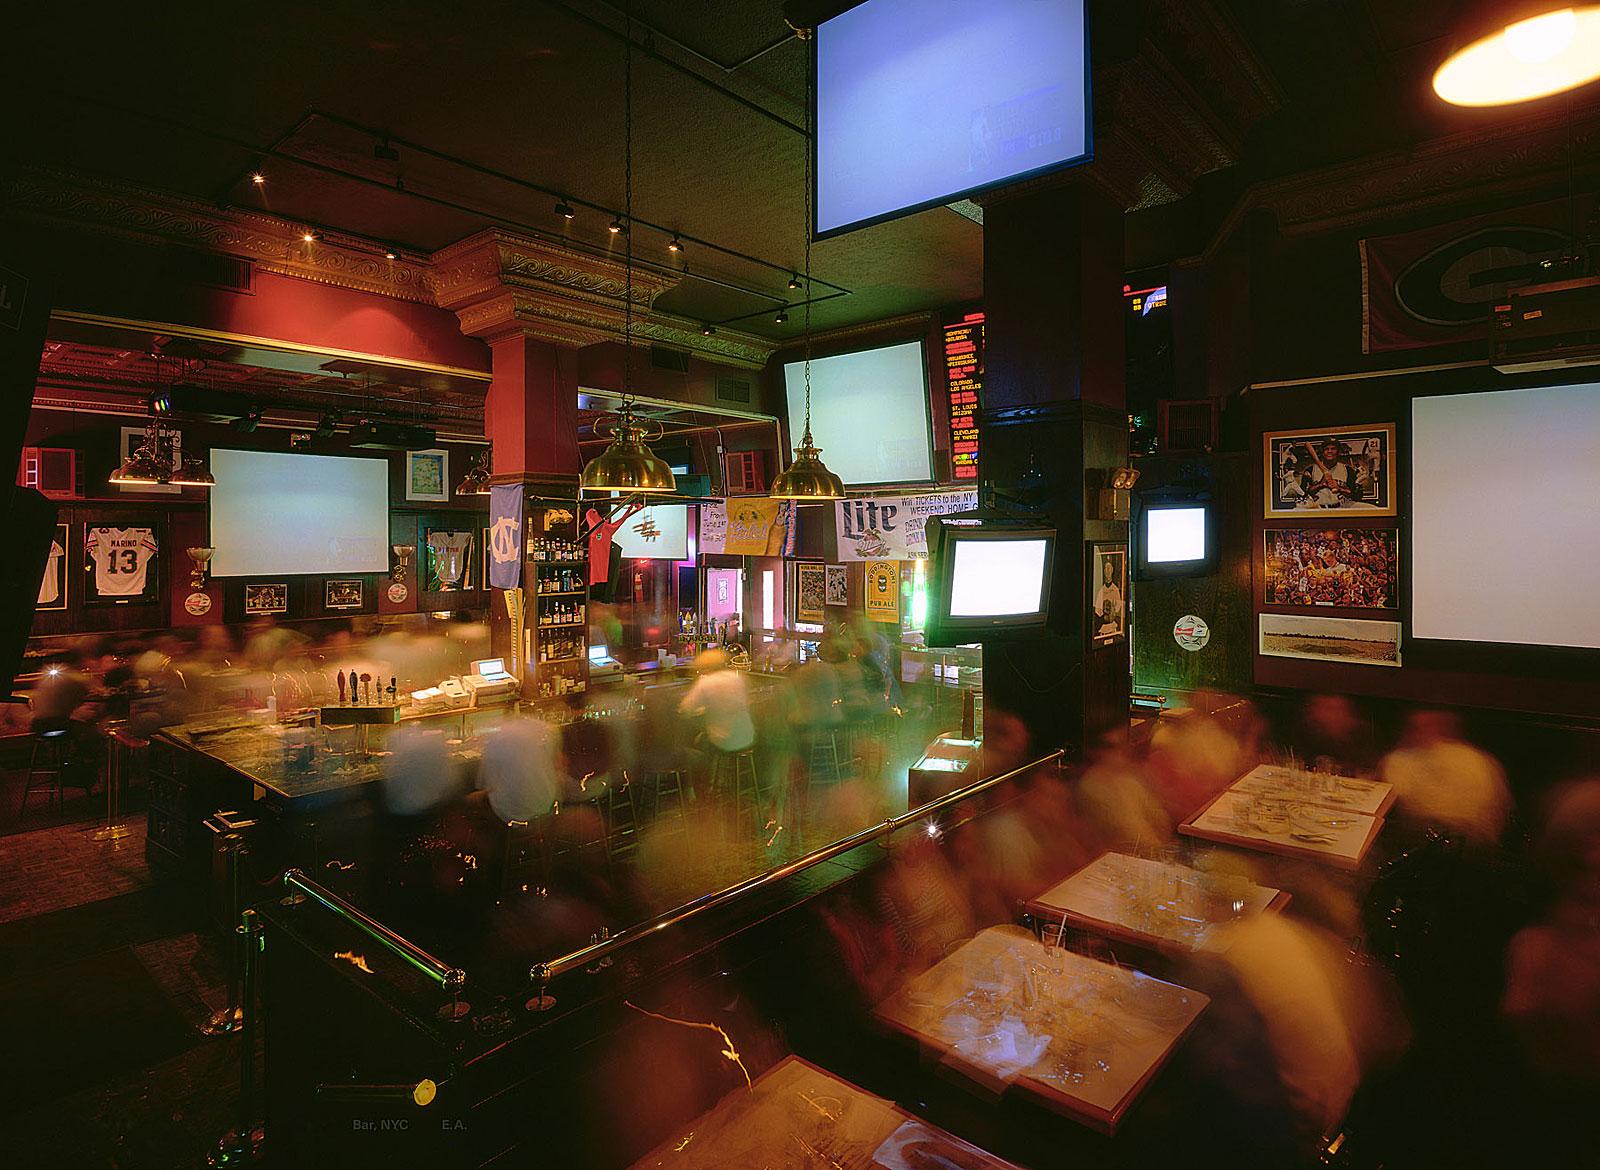 NBA finals, The Sporting Bar, New York (20.10 - 22.16 Uhr, 14.6.1998)